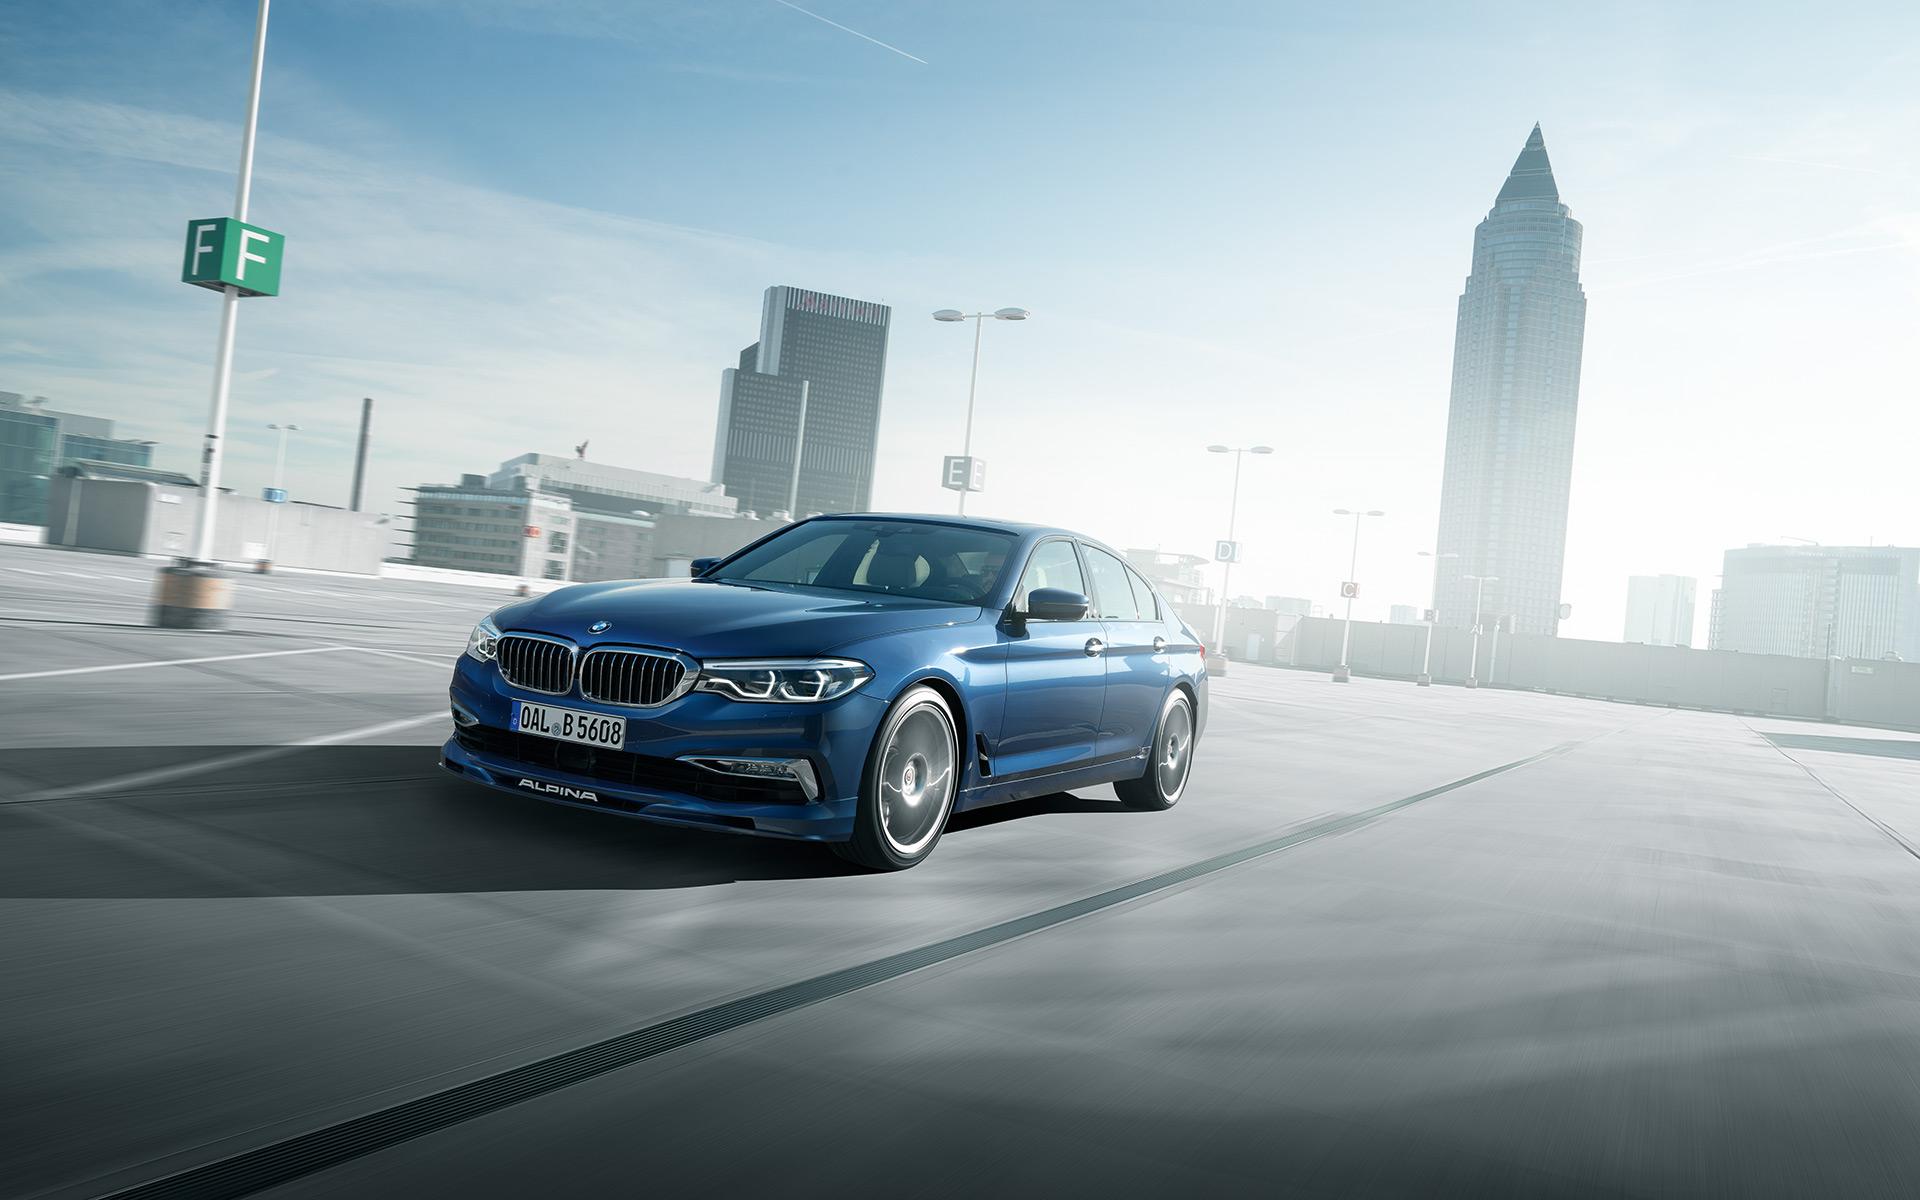 2017 07 BMW ALPINA B5 BITURBO 08